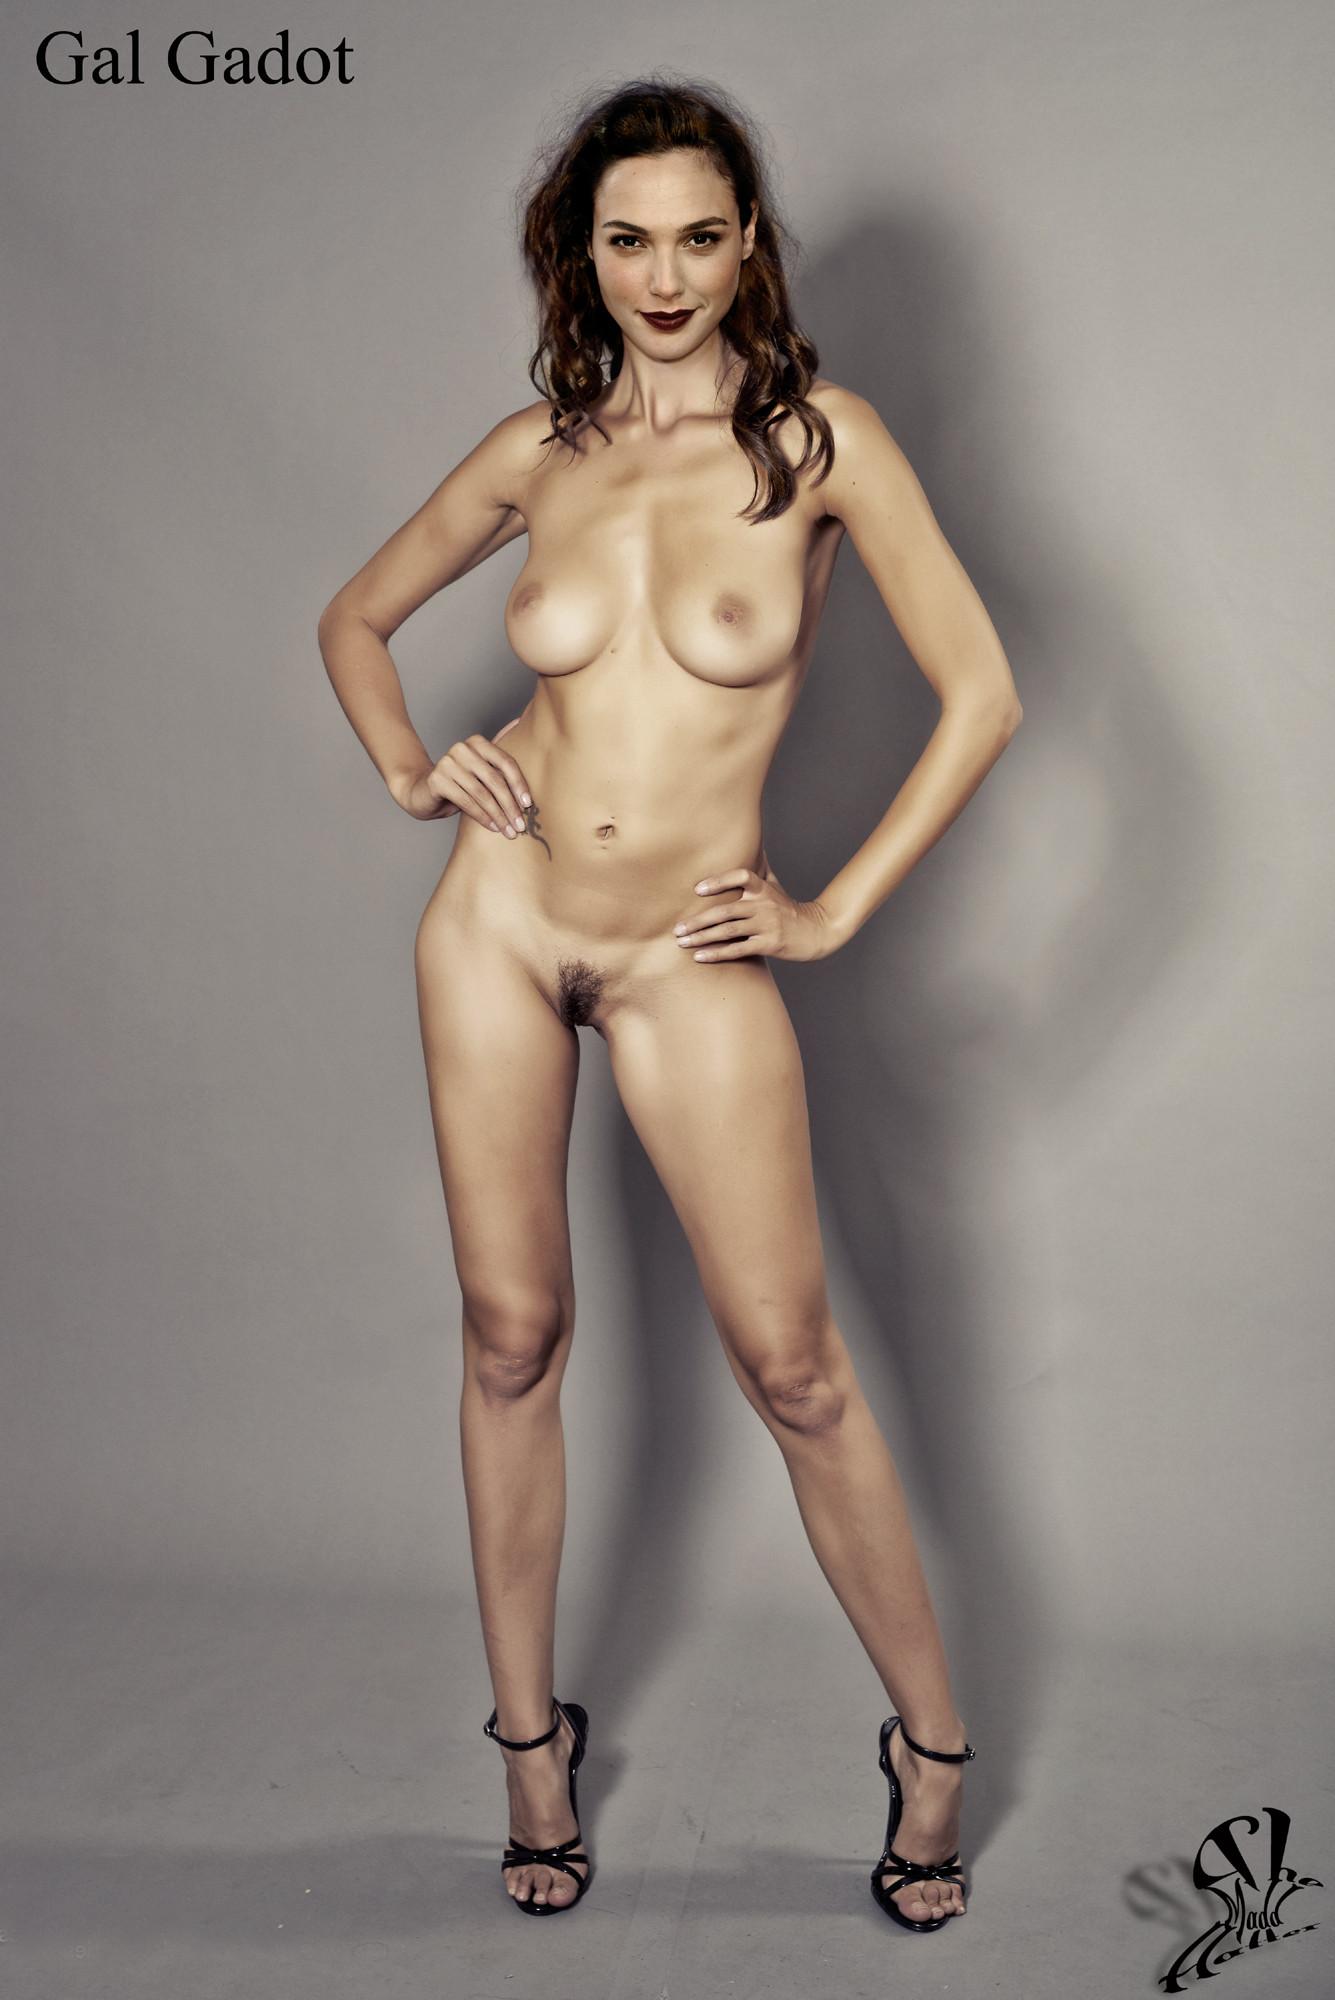 Gadot pics gal nude Gal Gadot